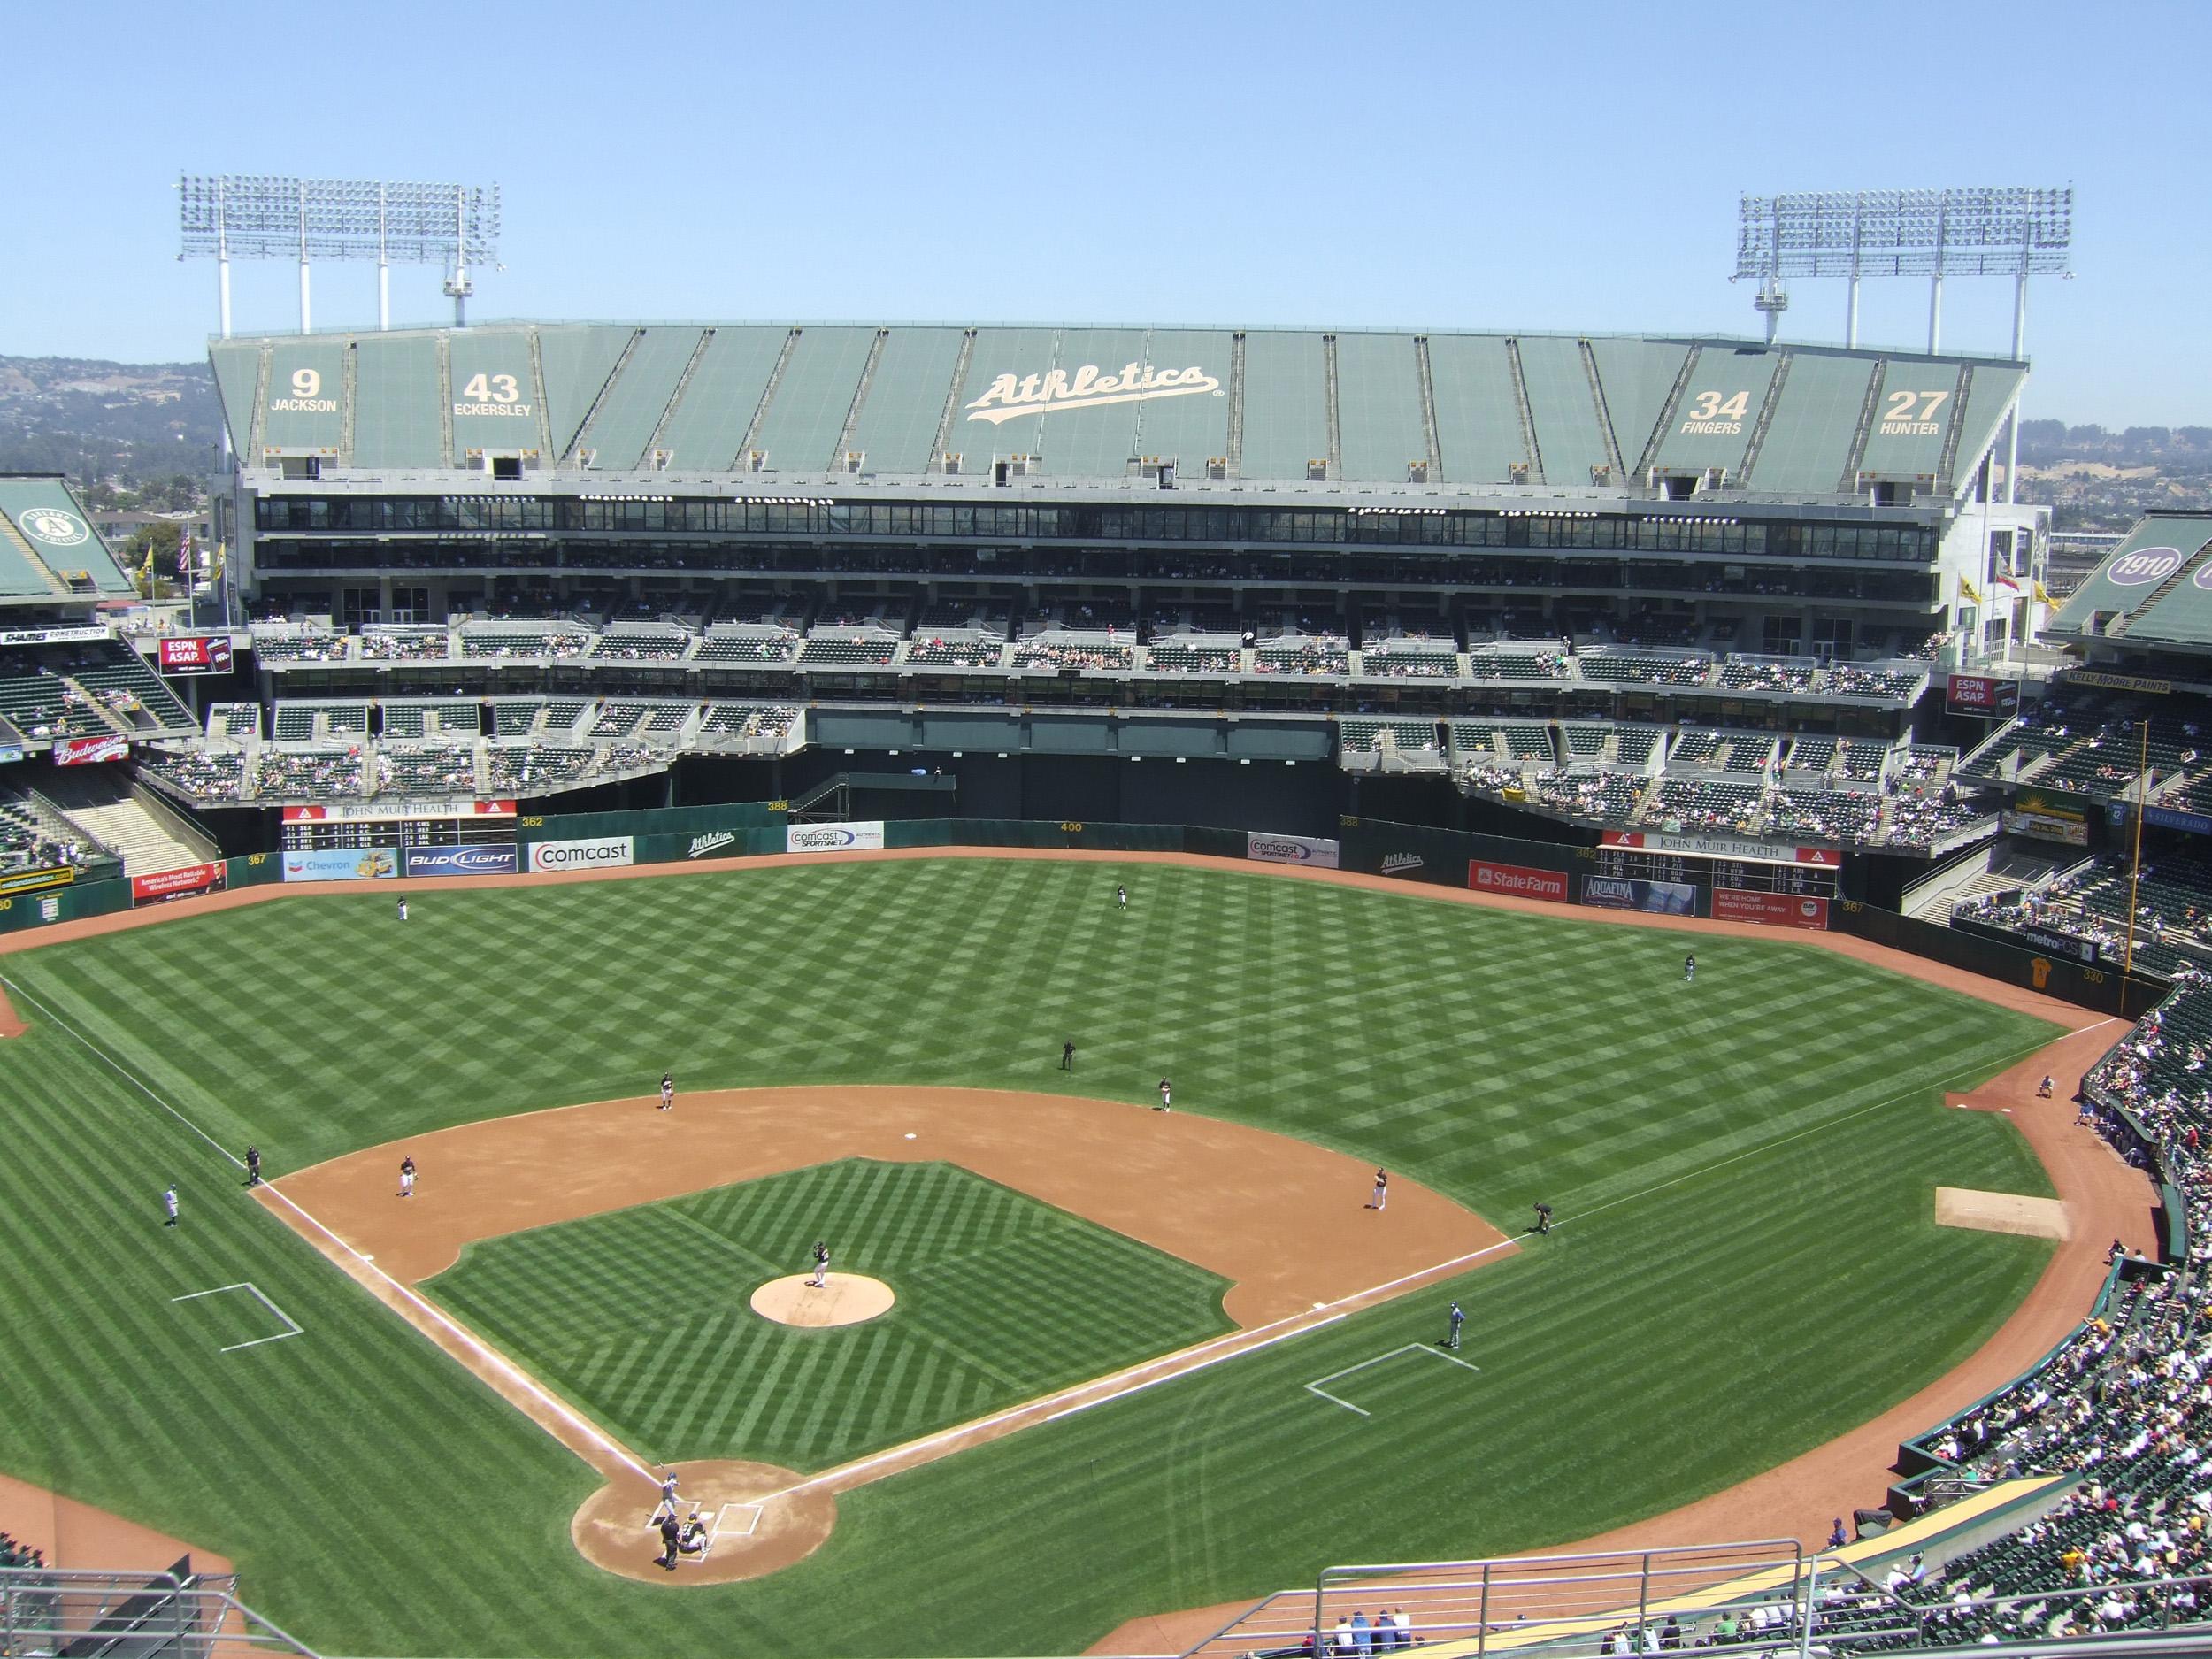 Oakland Coliseum Oakland A s ballpark Ballparks of Baseball